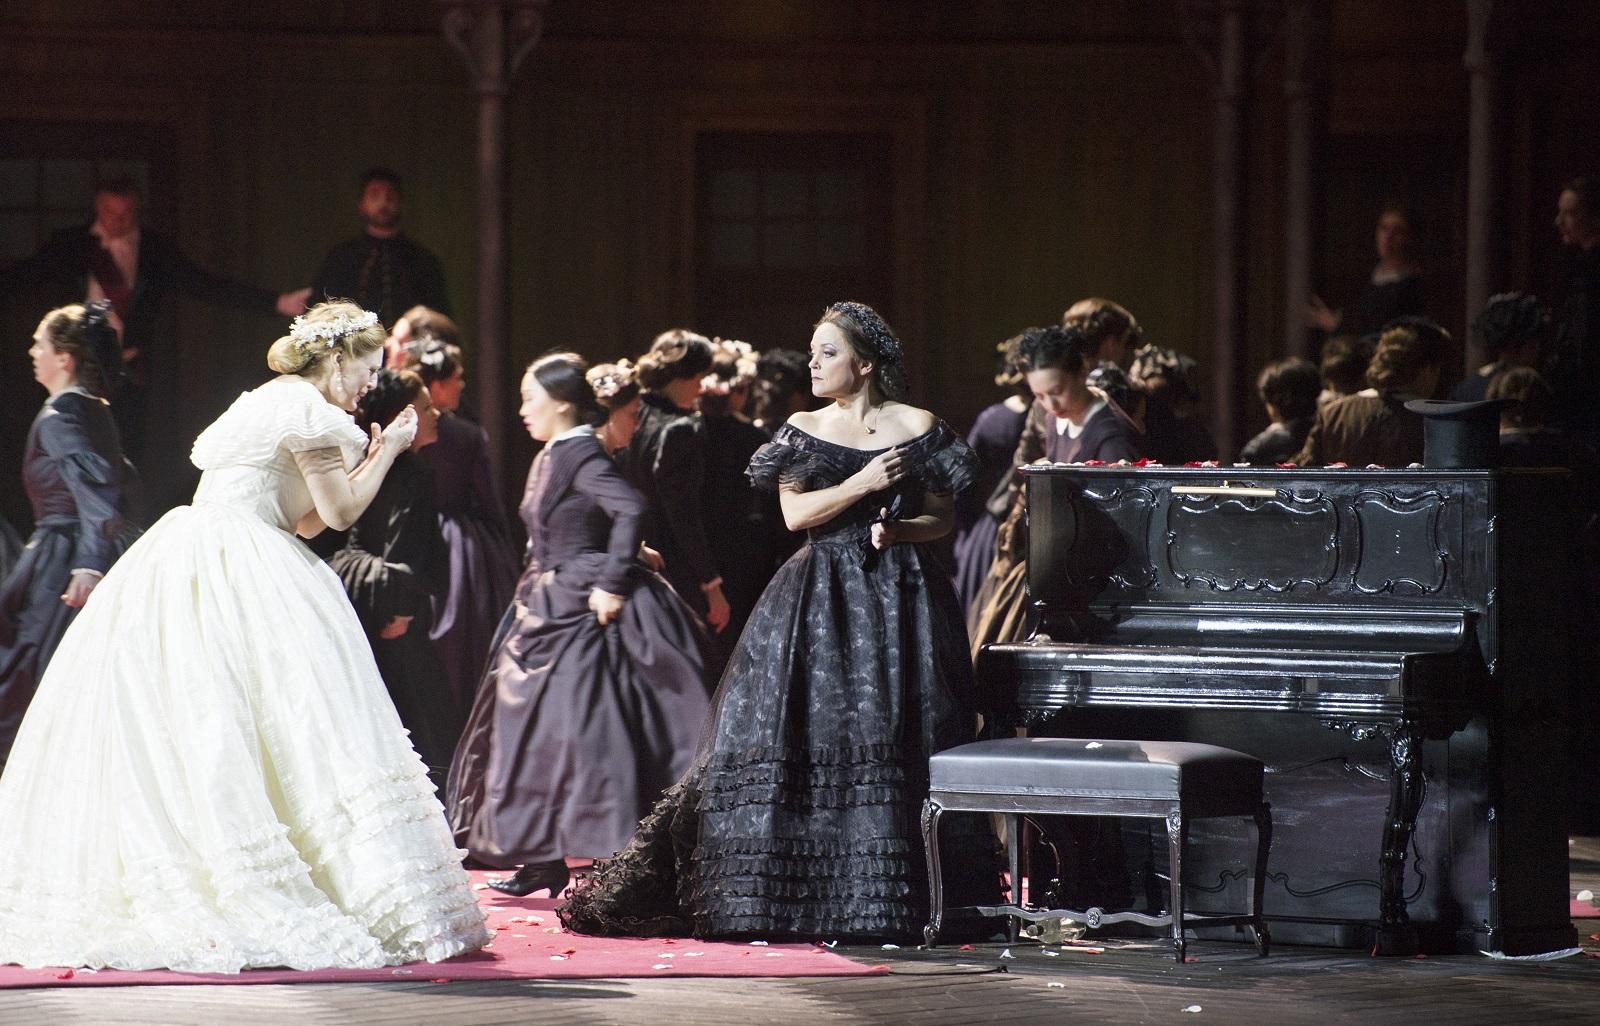 Martina Serafin (Elsa Von Brabant) et Evelyn Herlitzius (Ortrud) (© Monika Rittershaus / Opéra national de Paris)